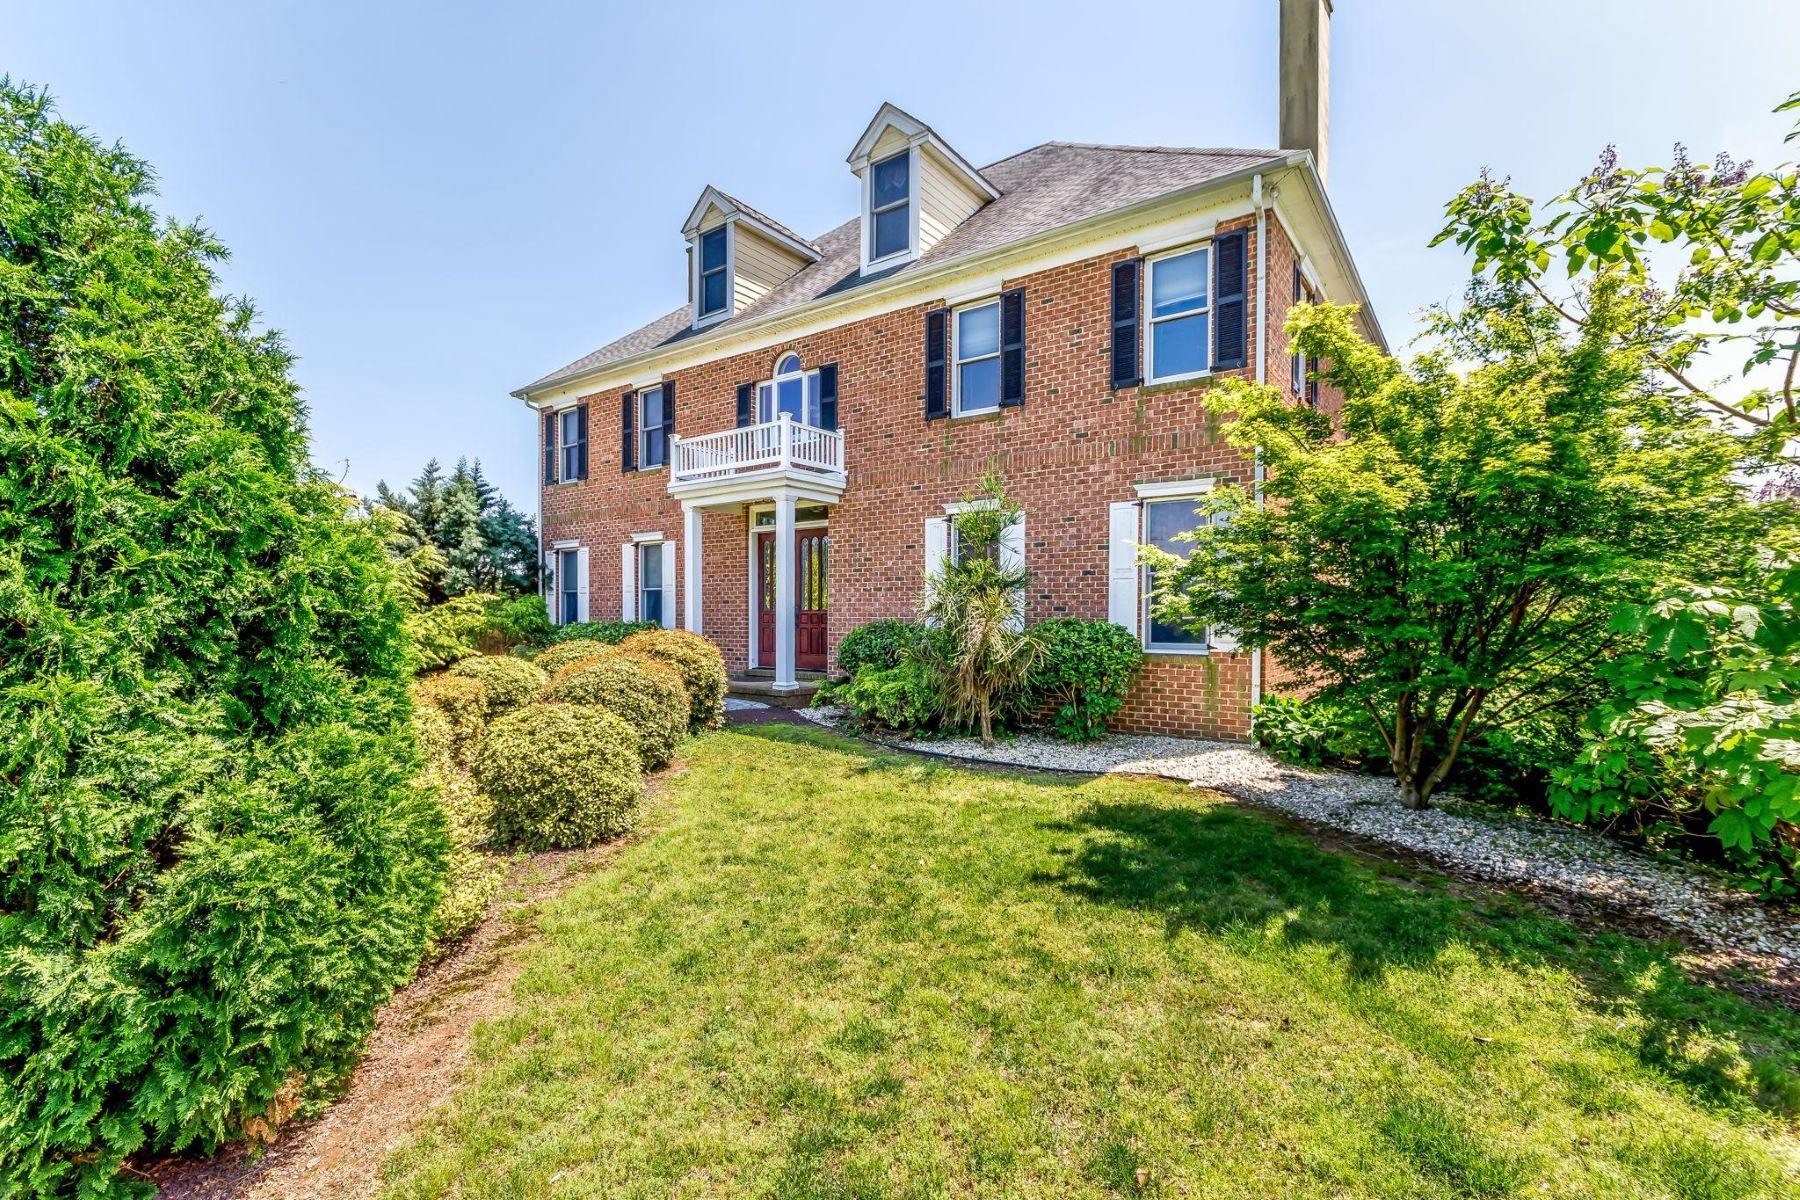 Additional photo for property listing at  Earleville, Maryland 21919 Estados Unidos